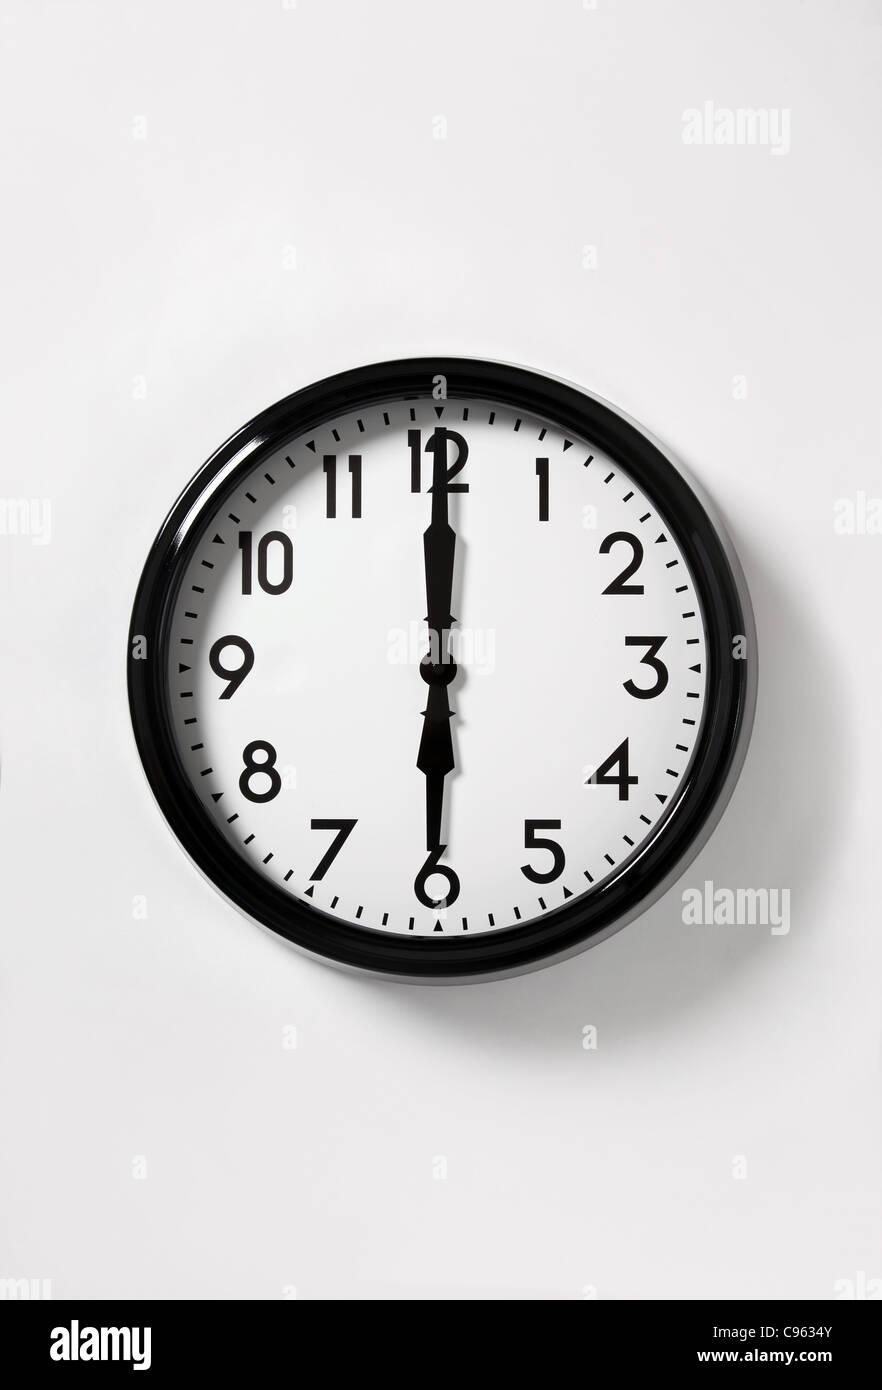 how to set roomba clock